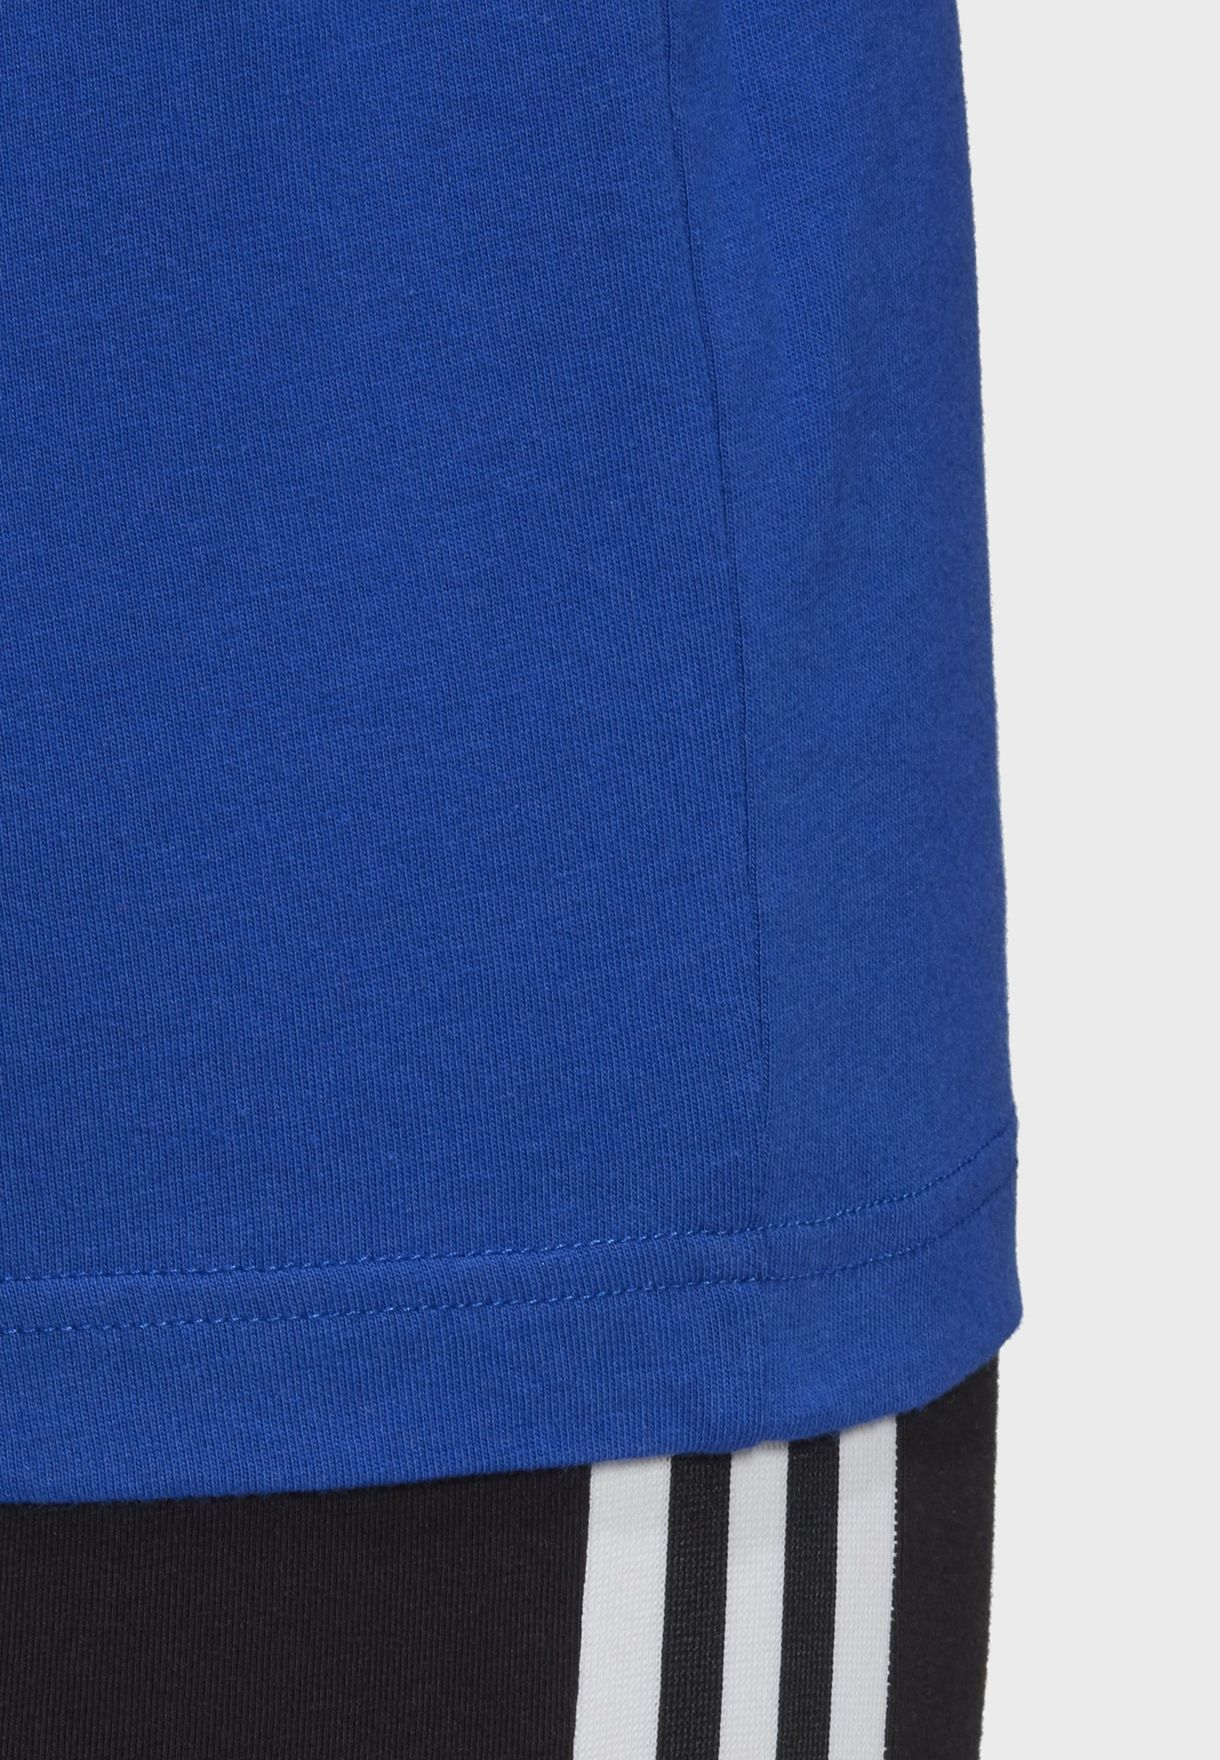 3 Stripes Adicolor Casual Women's T-Shirt